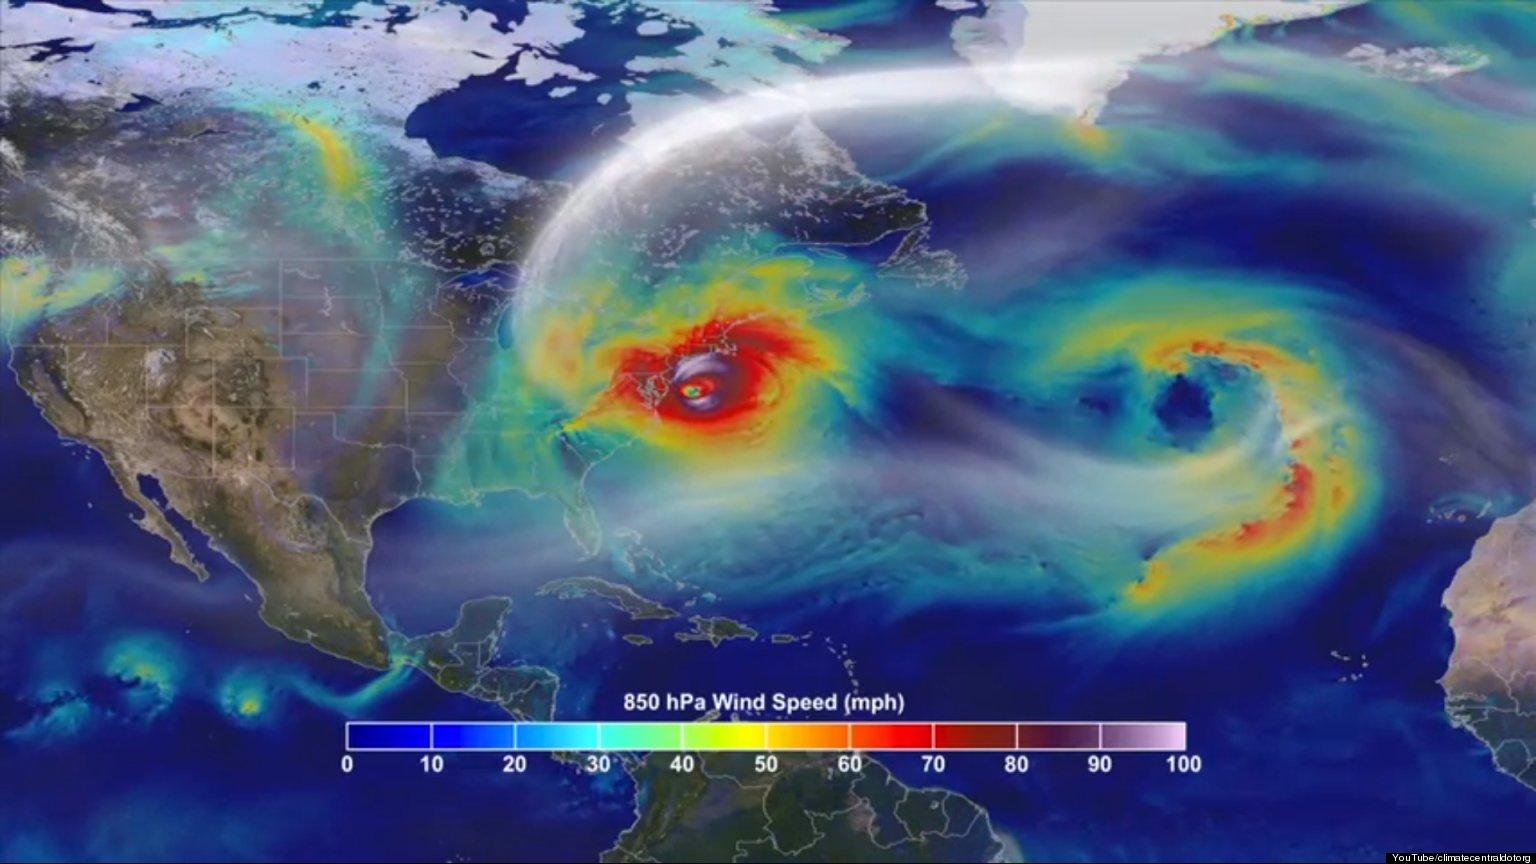 hurricane sandy animation shows storm hitting u s  east